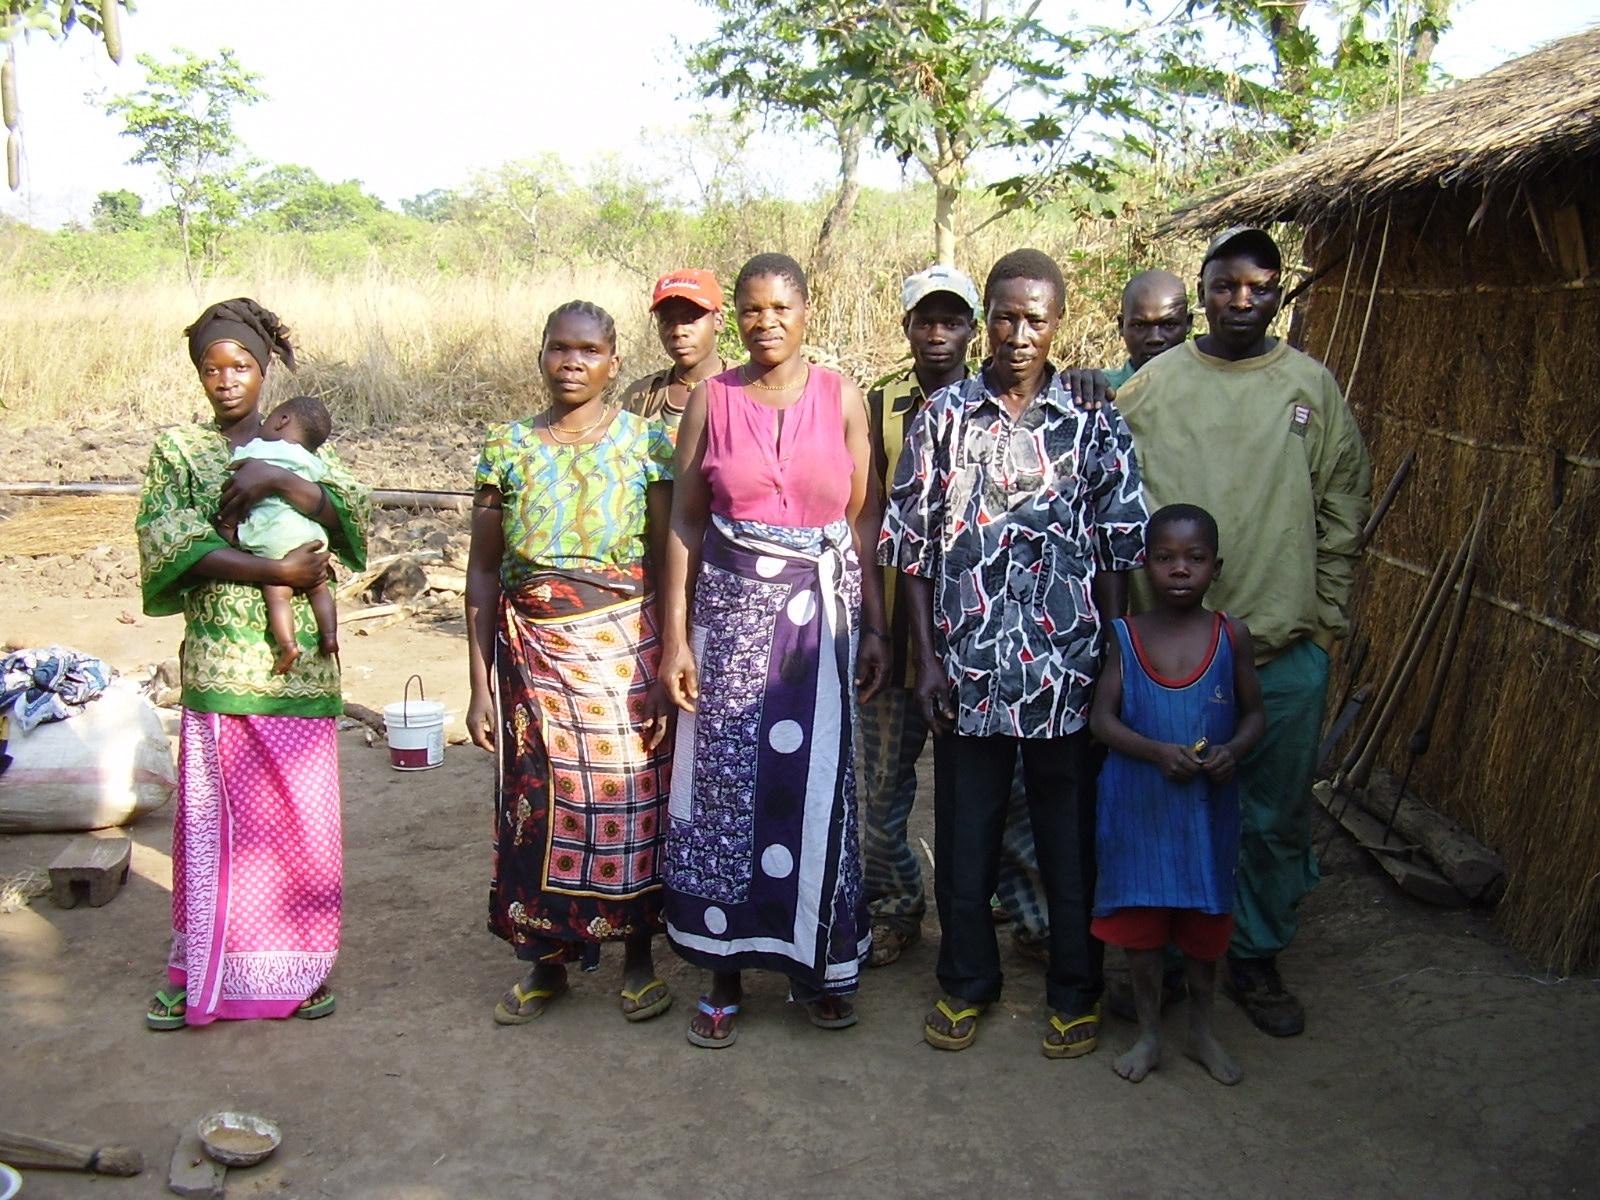 Fauna and Flora International a Ntakata Village Land Forest Reserve